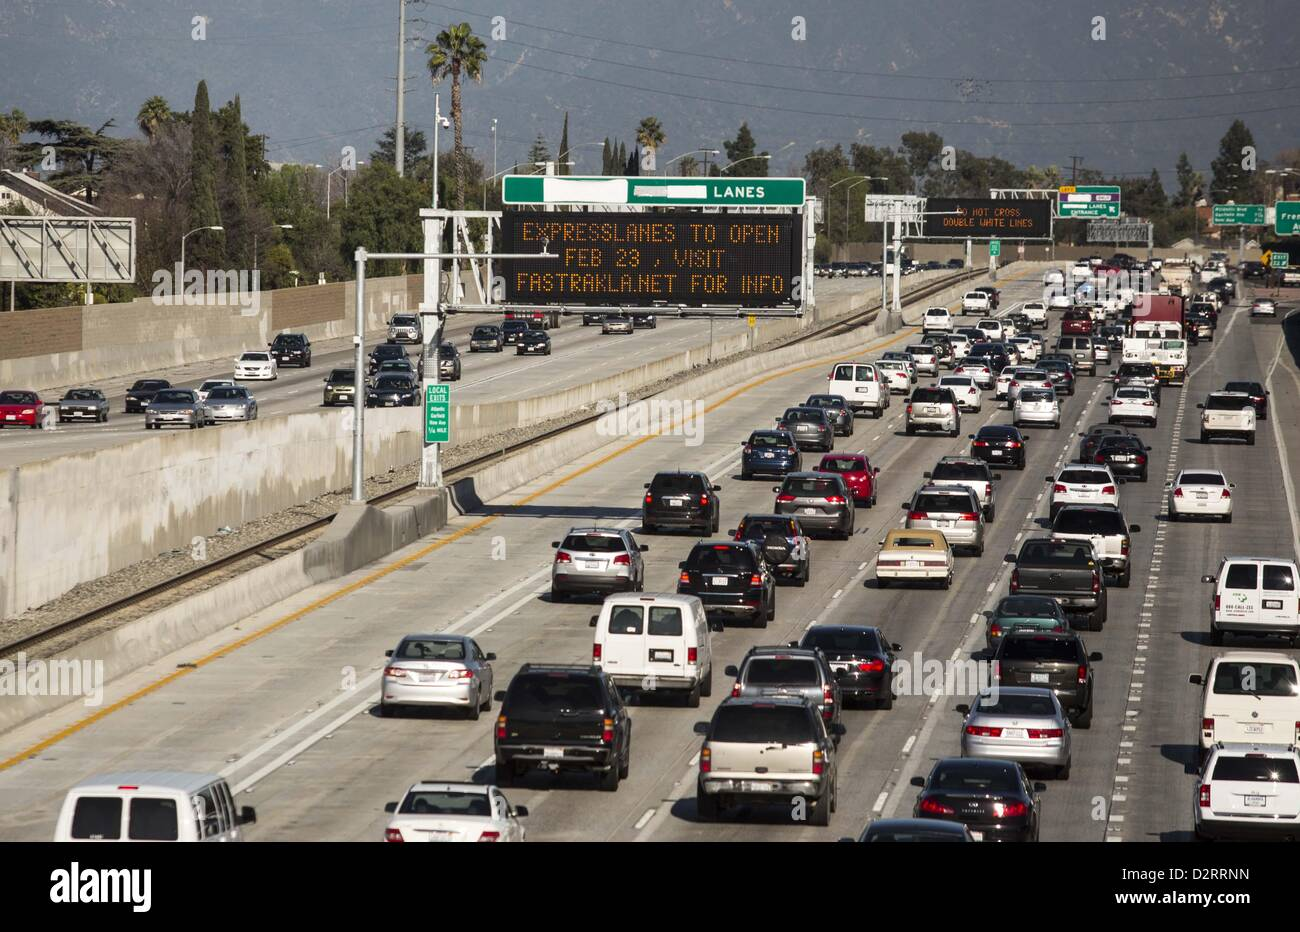 Express Lane California >> Jan 31 2013 Los Angeles California Ca United States